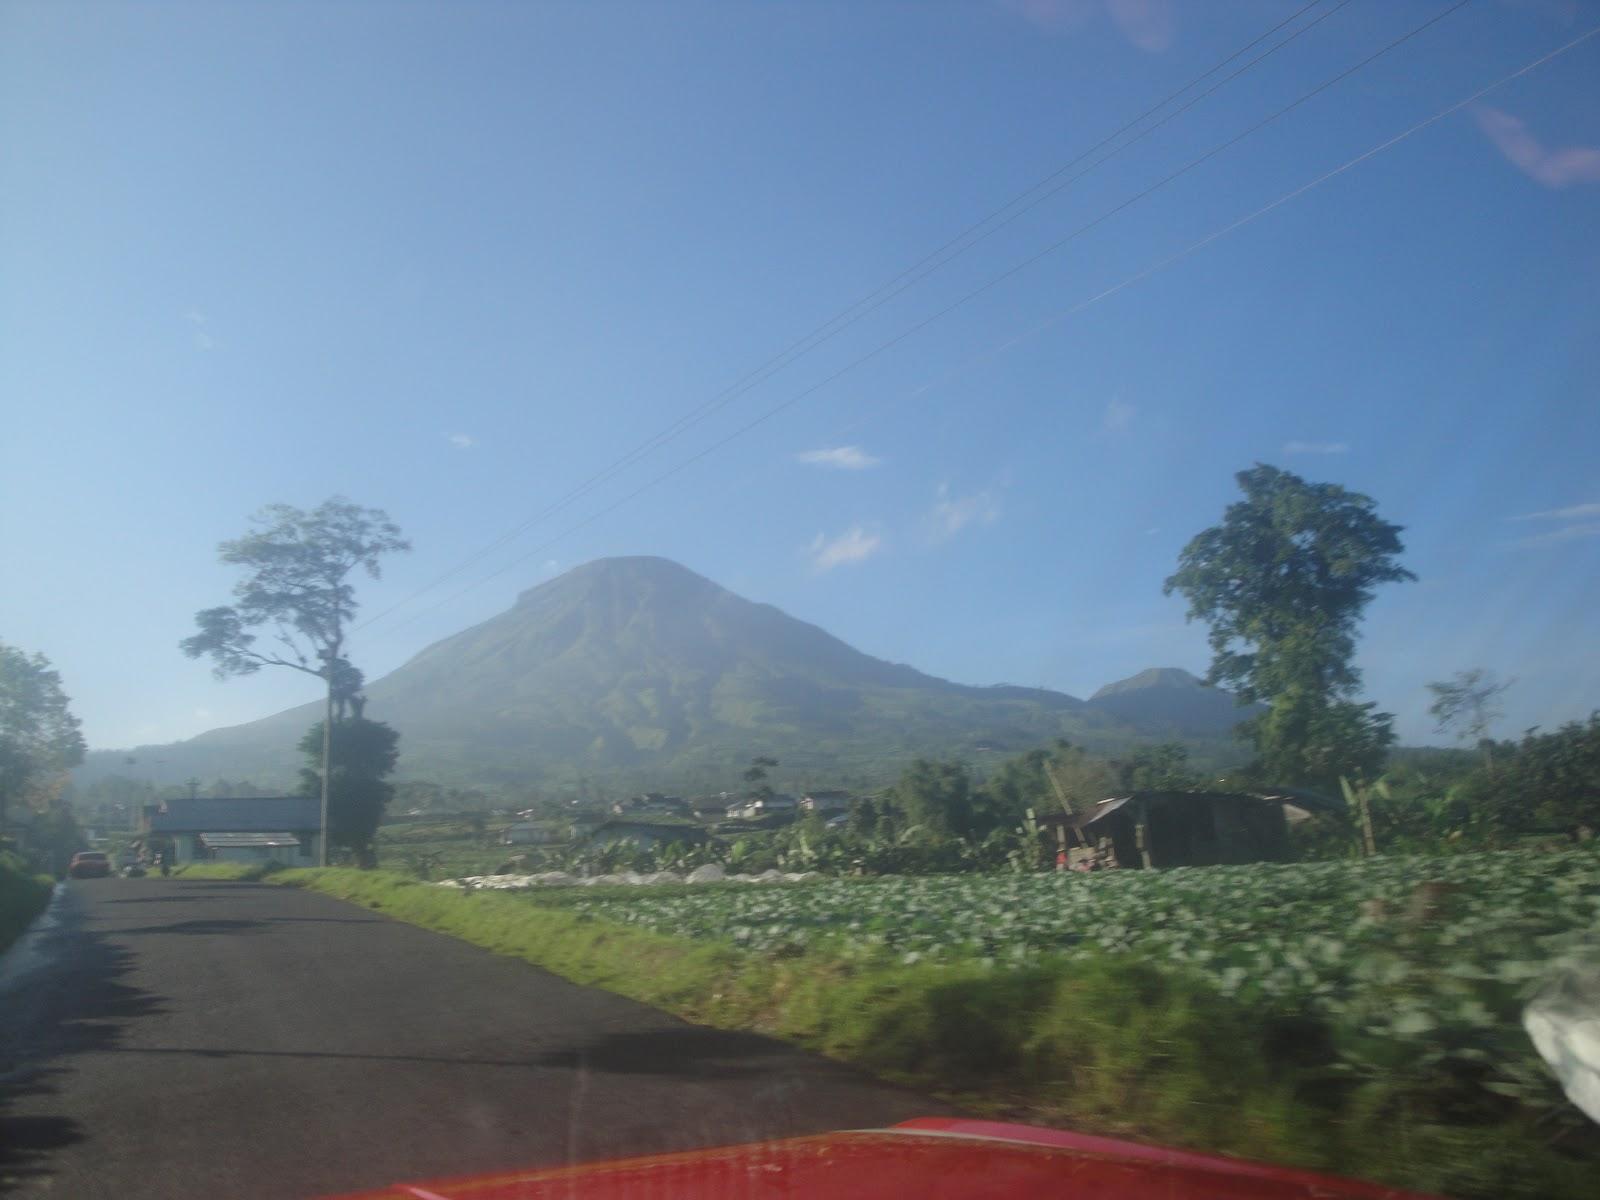 Wawasan Pariwisata: Pengertian dan Definisi Wisata